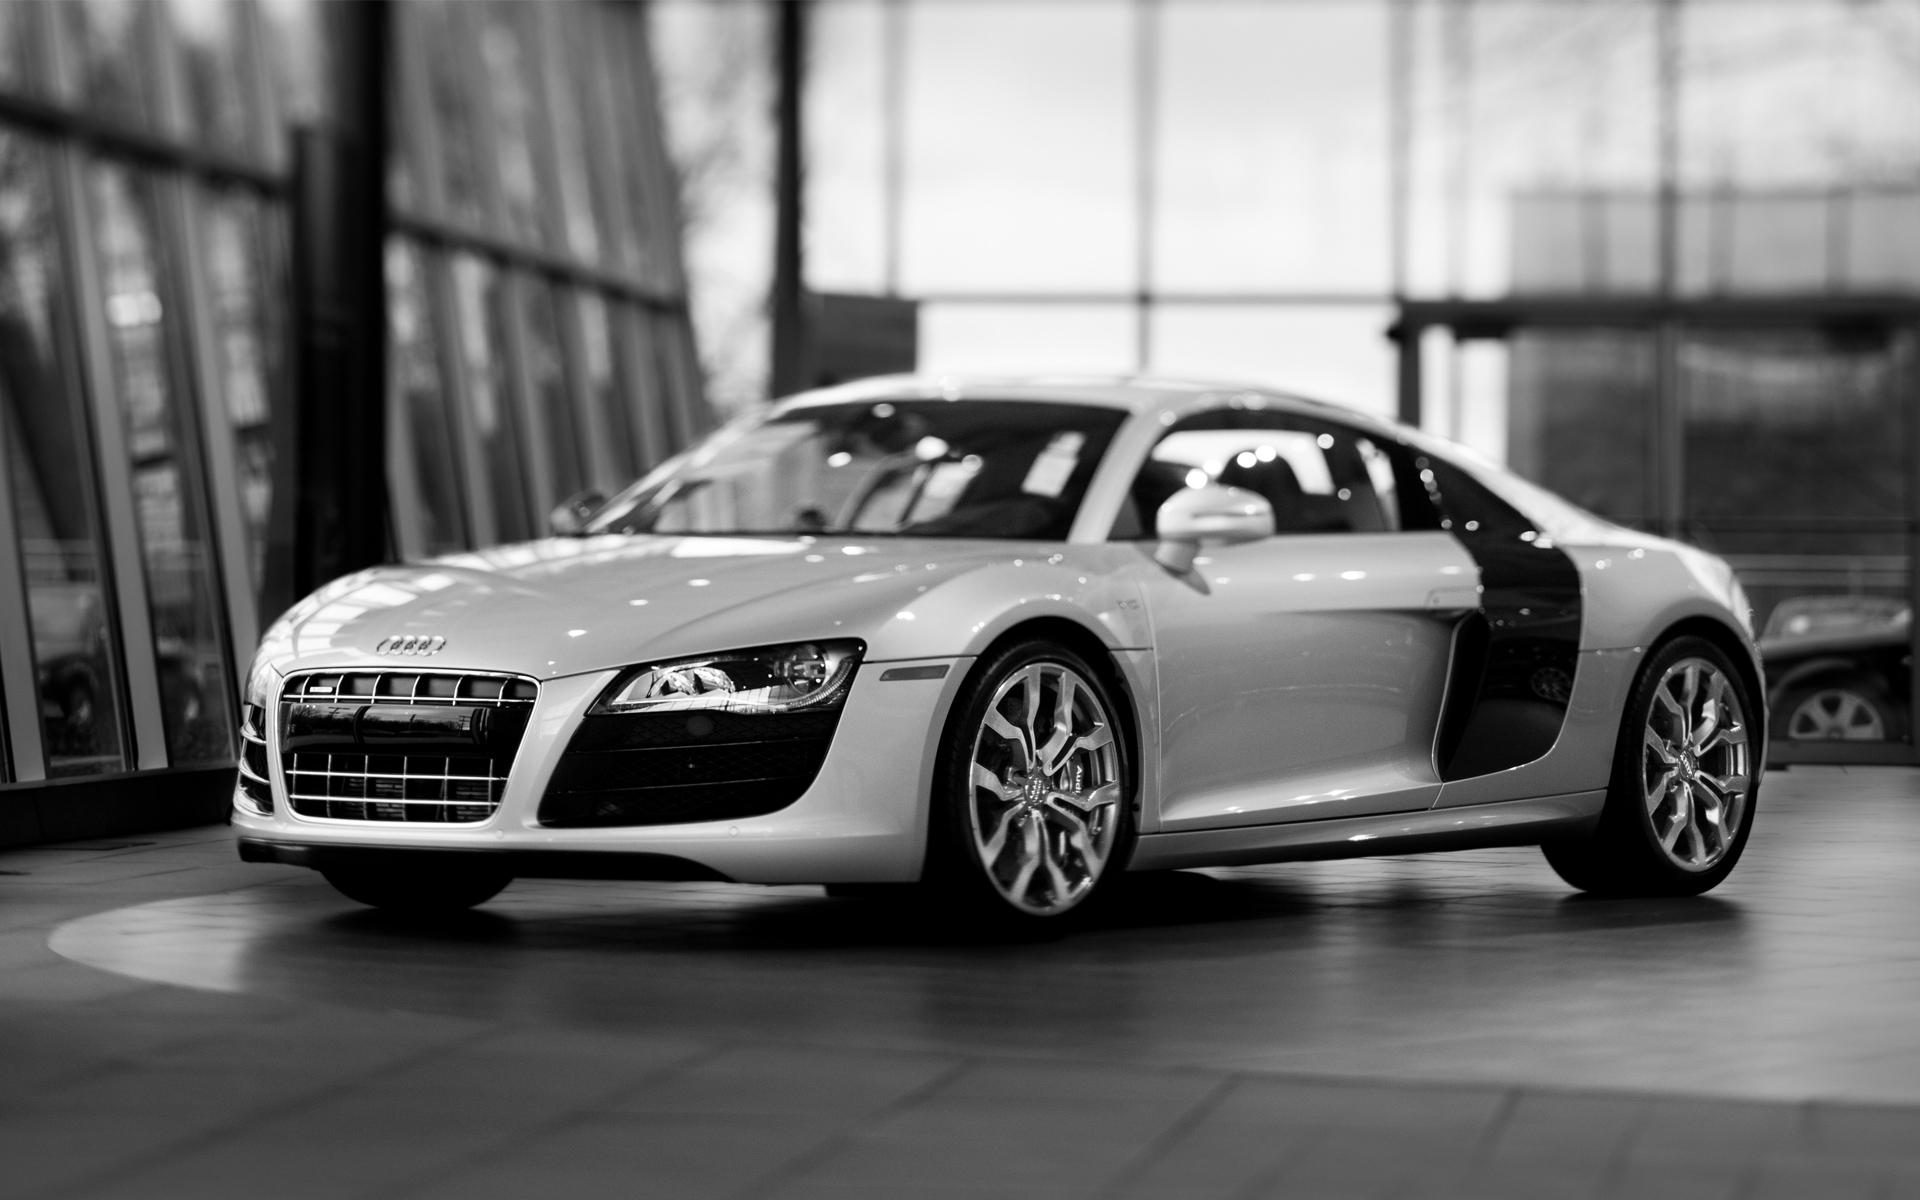 Audi R8 v10 FSI Coupe Wallpaper | HD Car Wallpapers | ID #2441